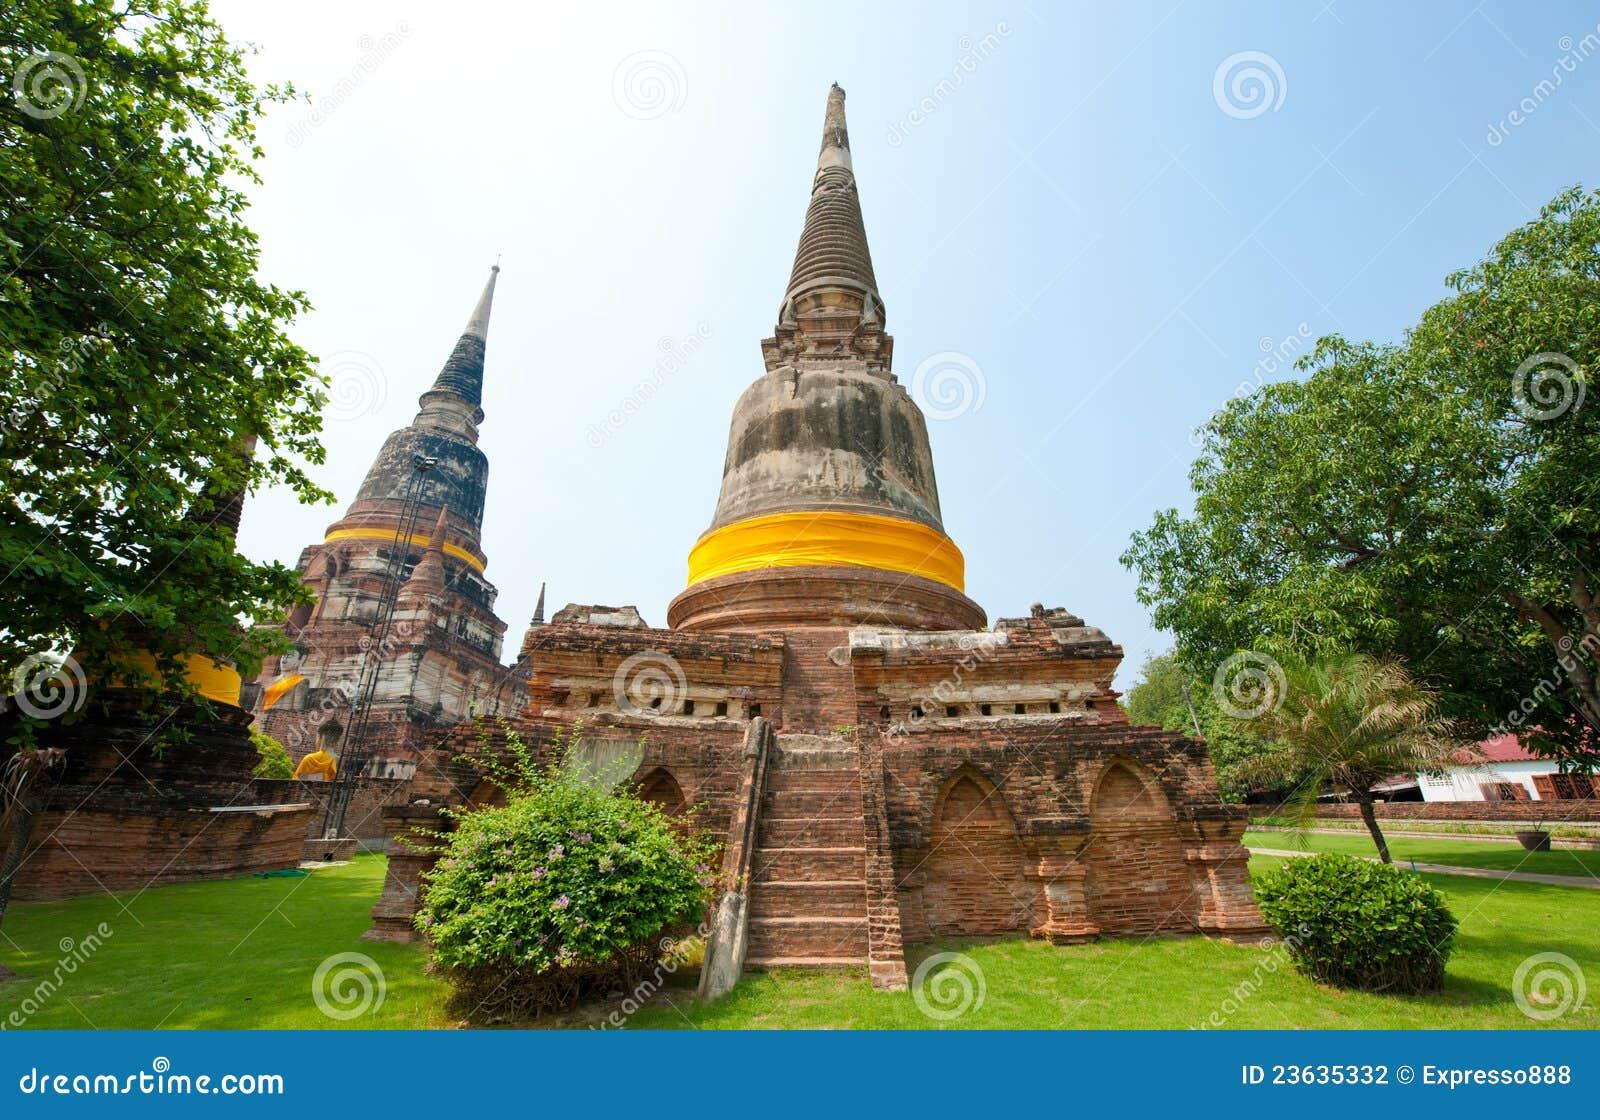 Wat Yai Chai Mongkol- Thailand Stock Photography - Image ...